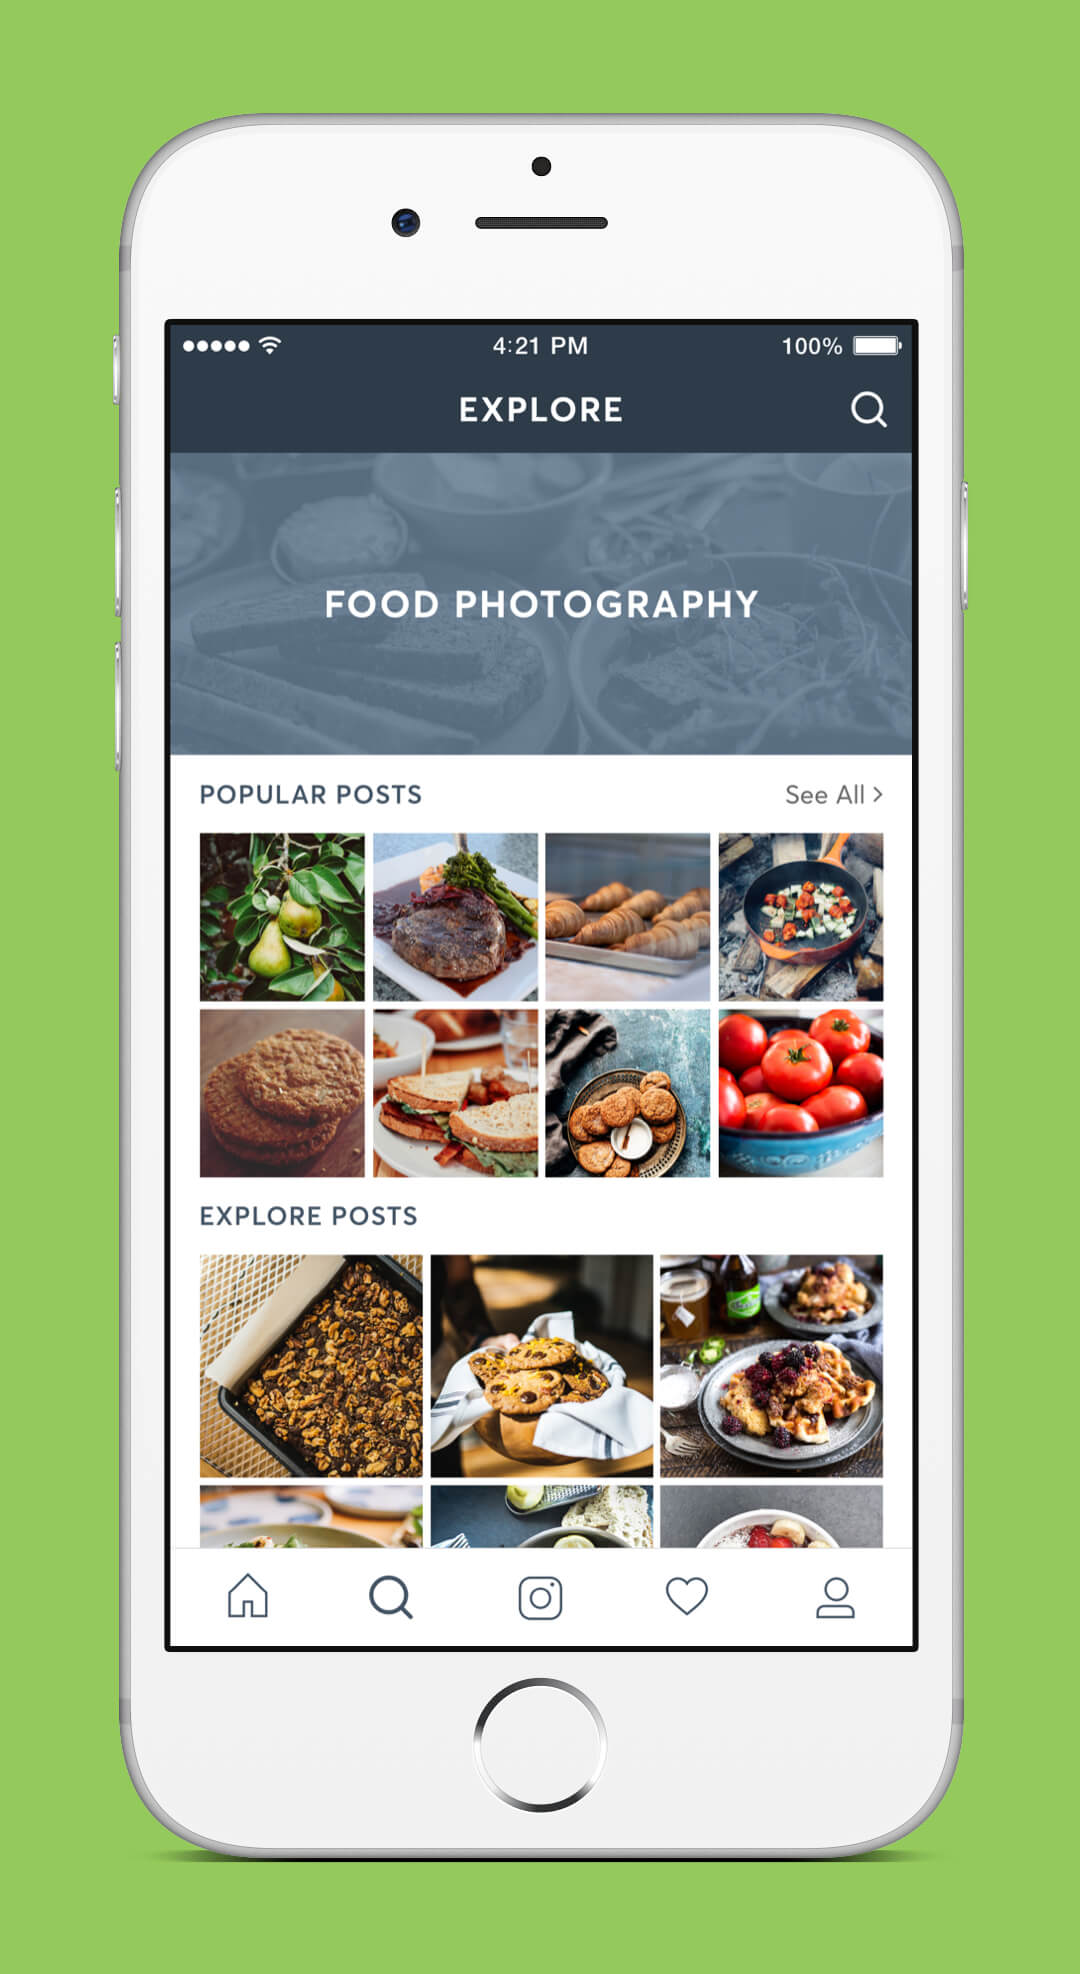 Instagram Redesign - Explore Screen